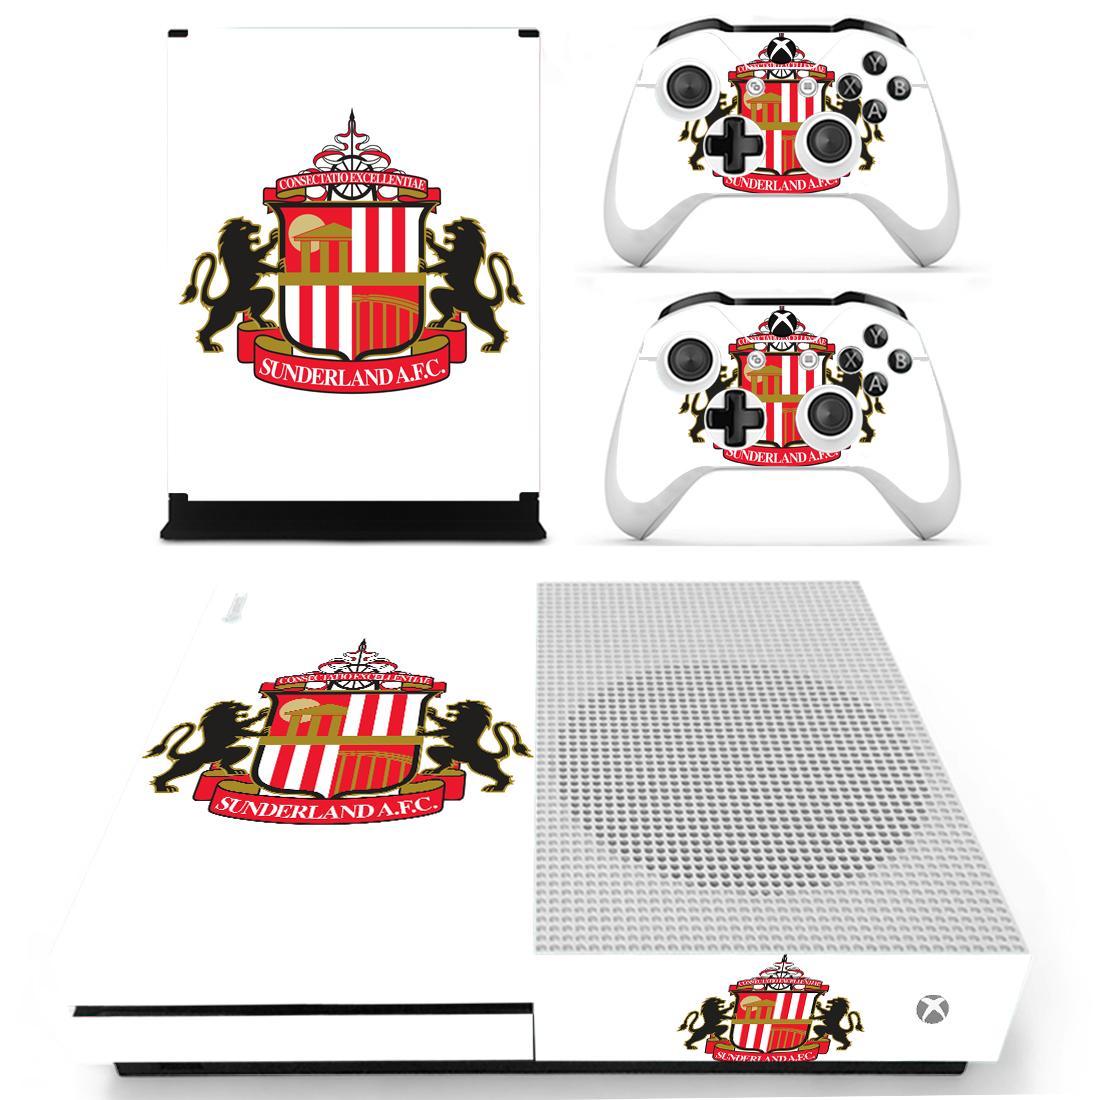 Xbox One S Polep Skin Sunderland AFC